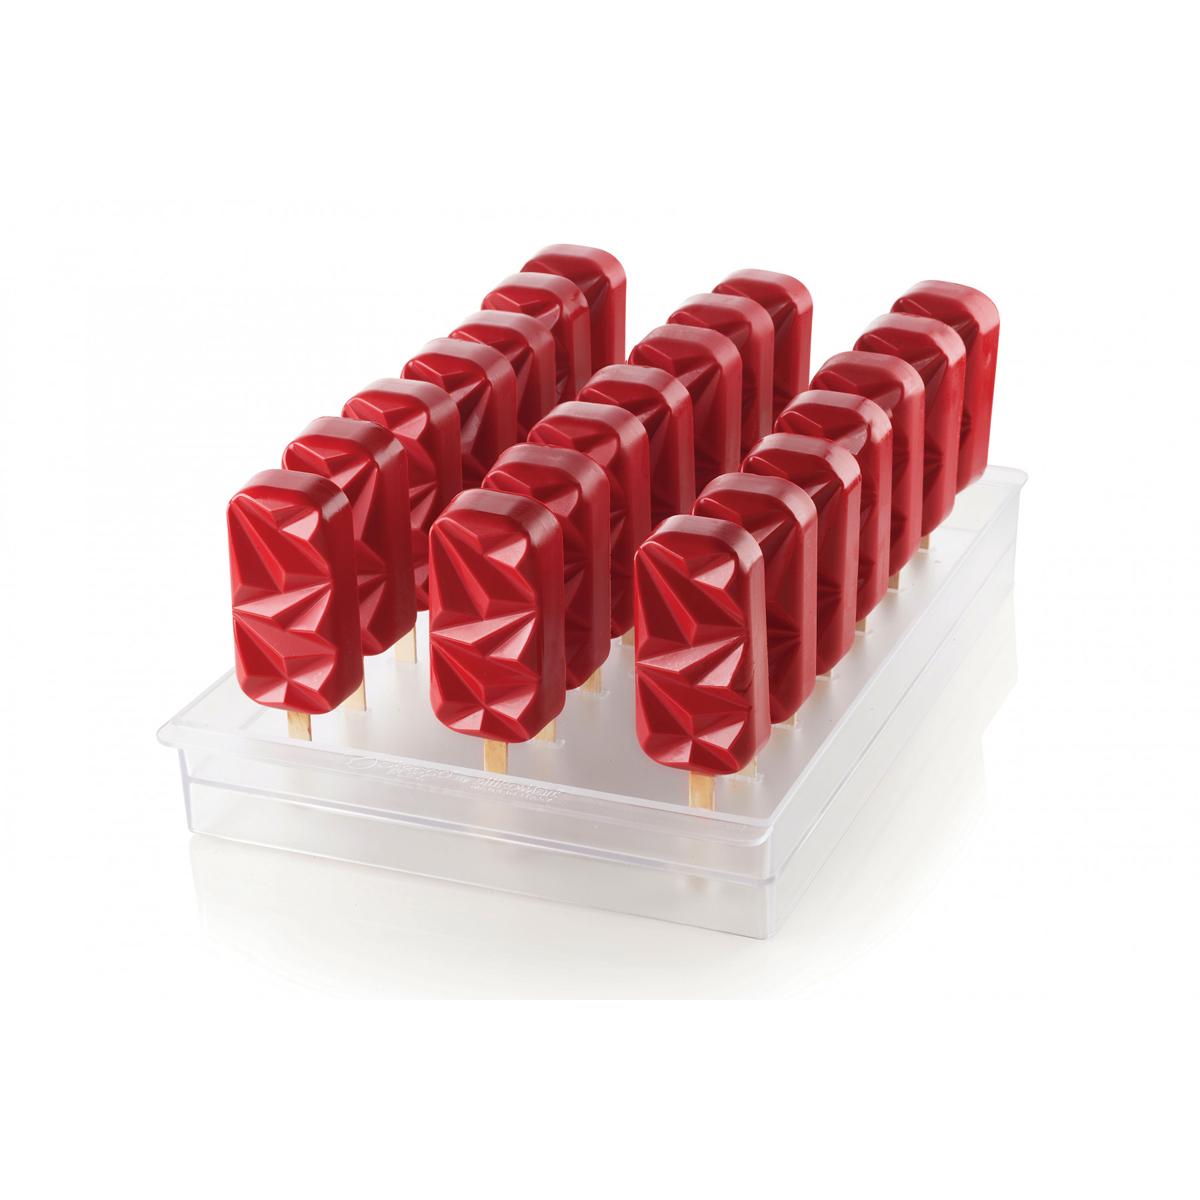 Shock 12 Cavities Silikomart Silicone Mold for Ice Cream Pops